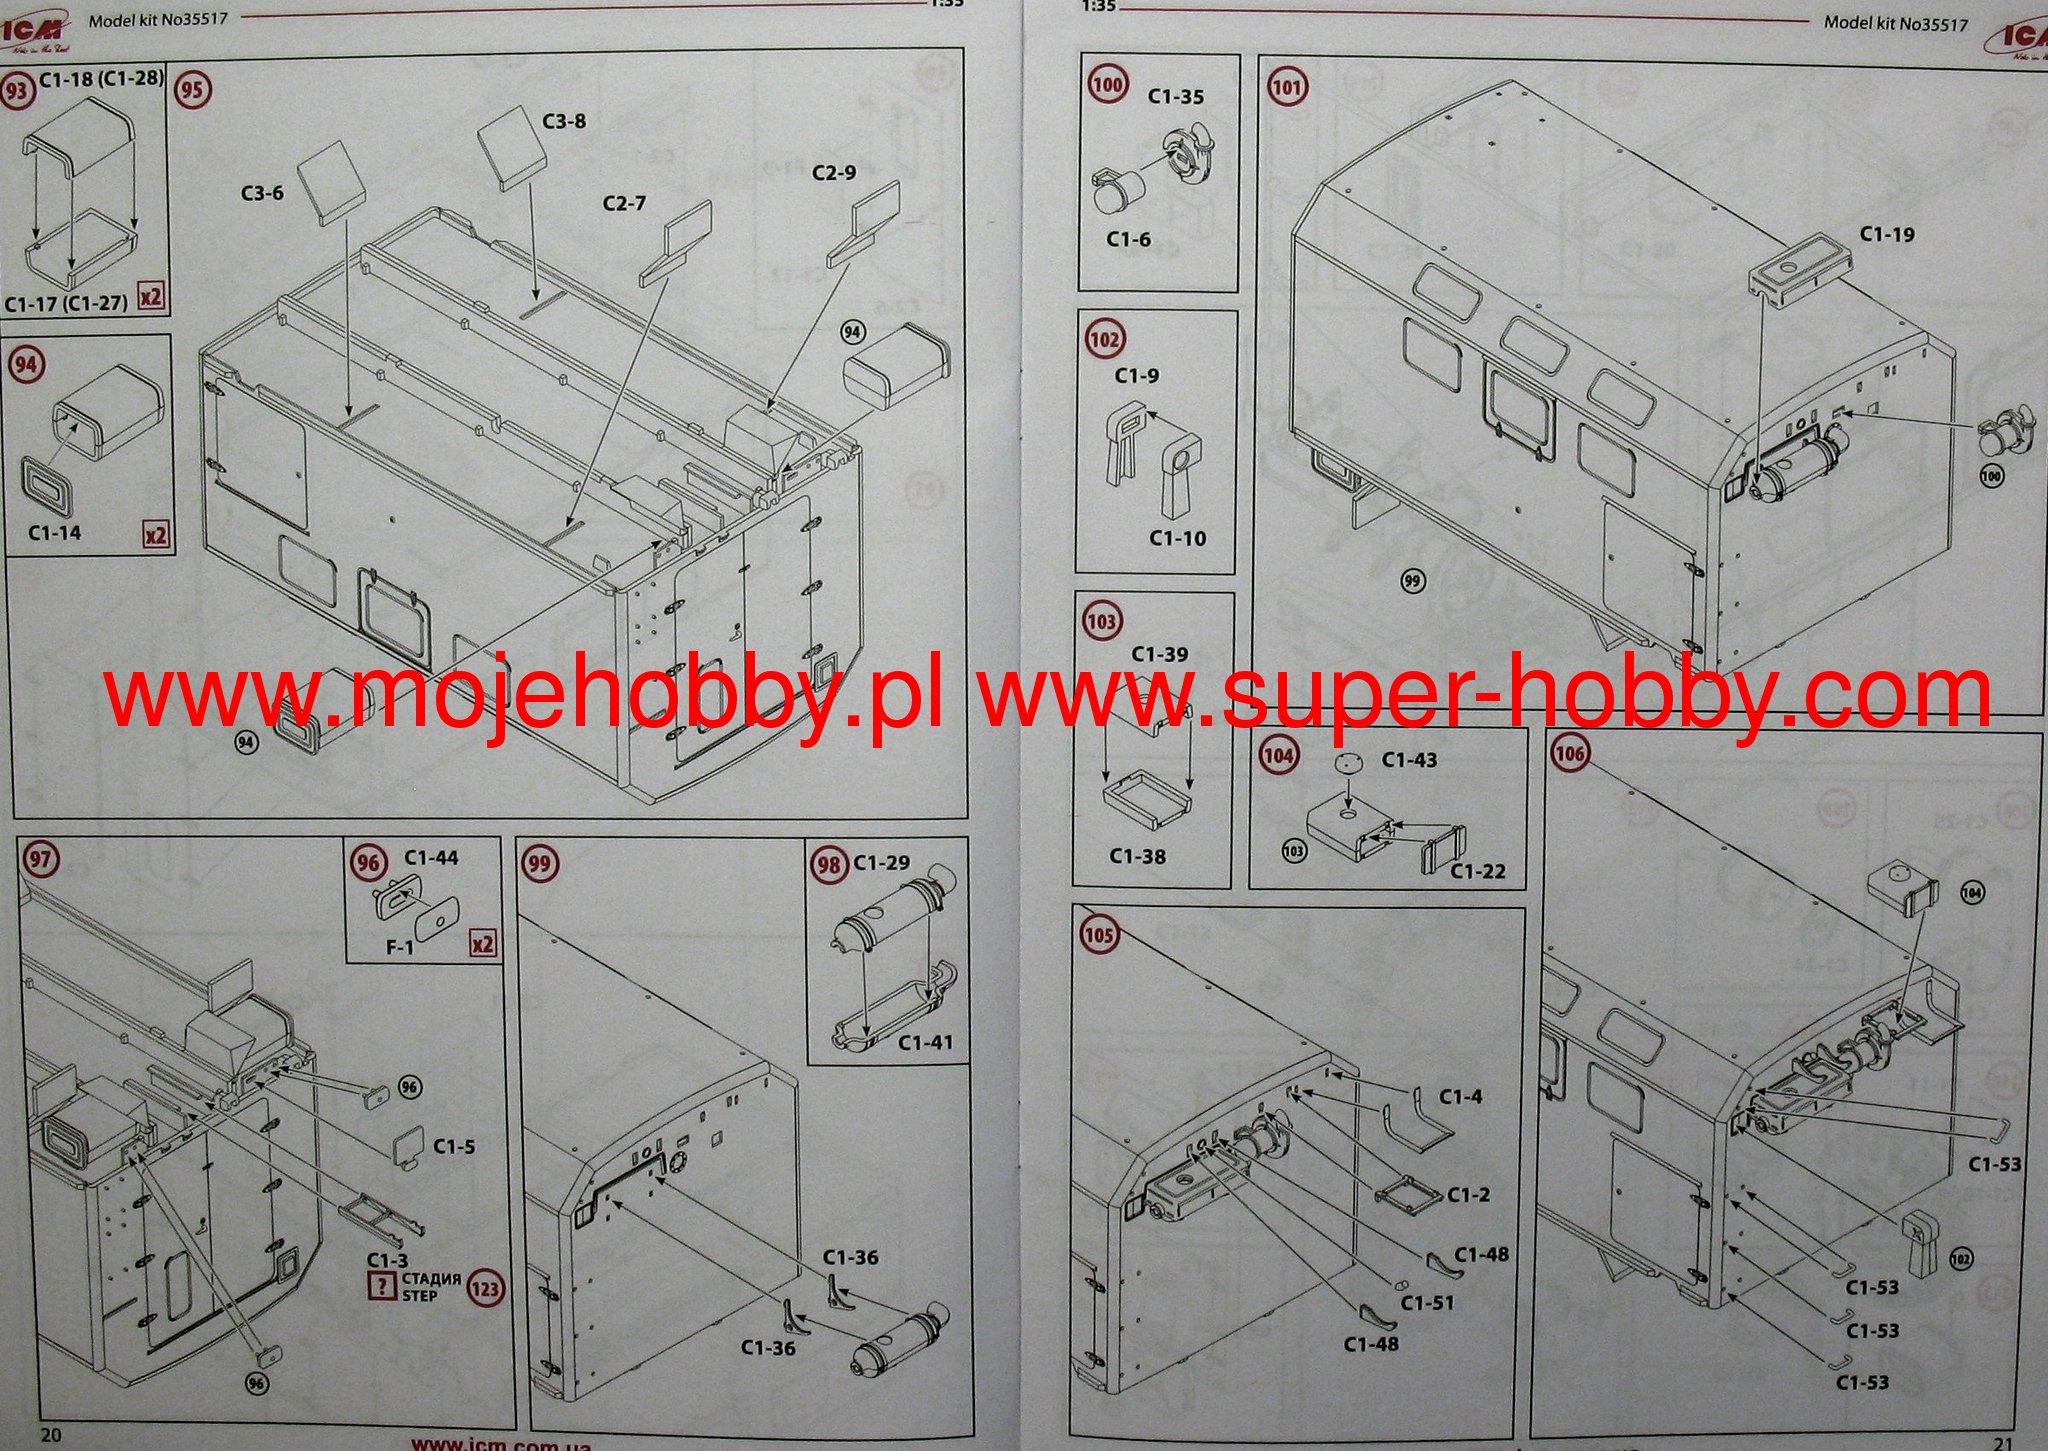 icm literature wiring diagrams wiring diagramicm literature wiring diagrams